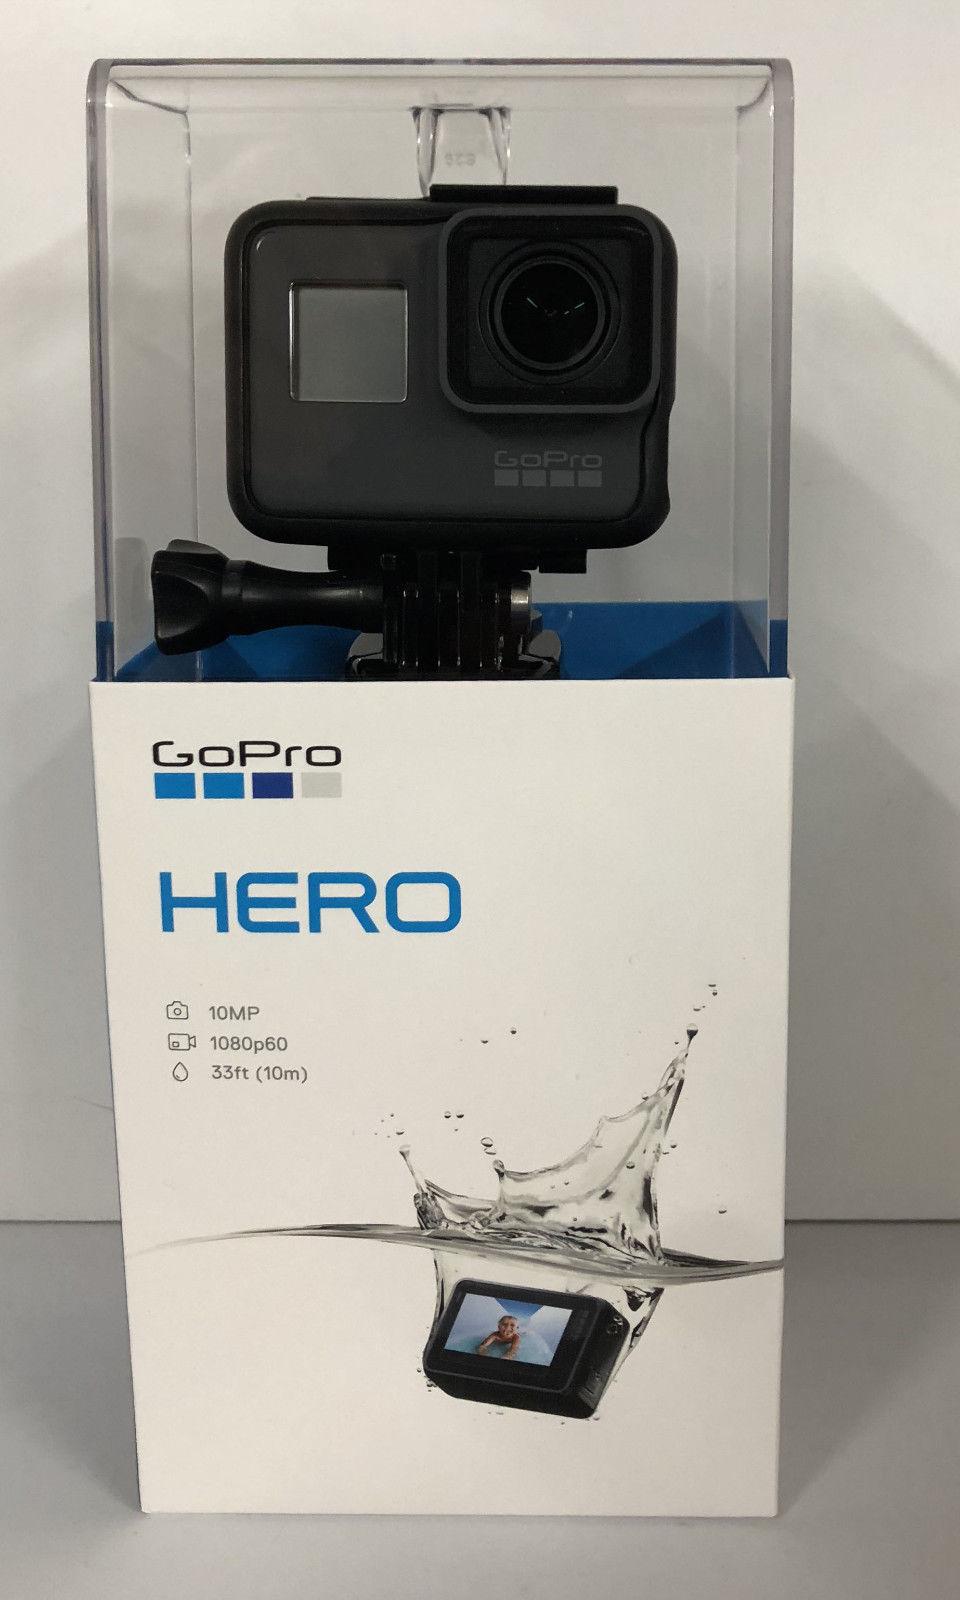 GoPro Hero Session Version 1080p Wi-Fi Watertight Digital camera + 32GB SD Card